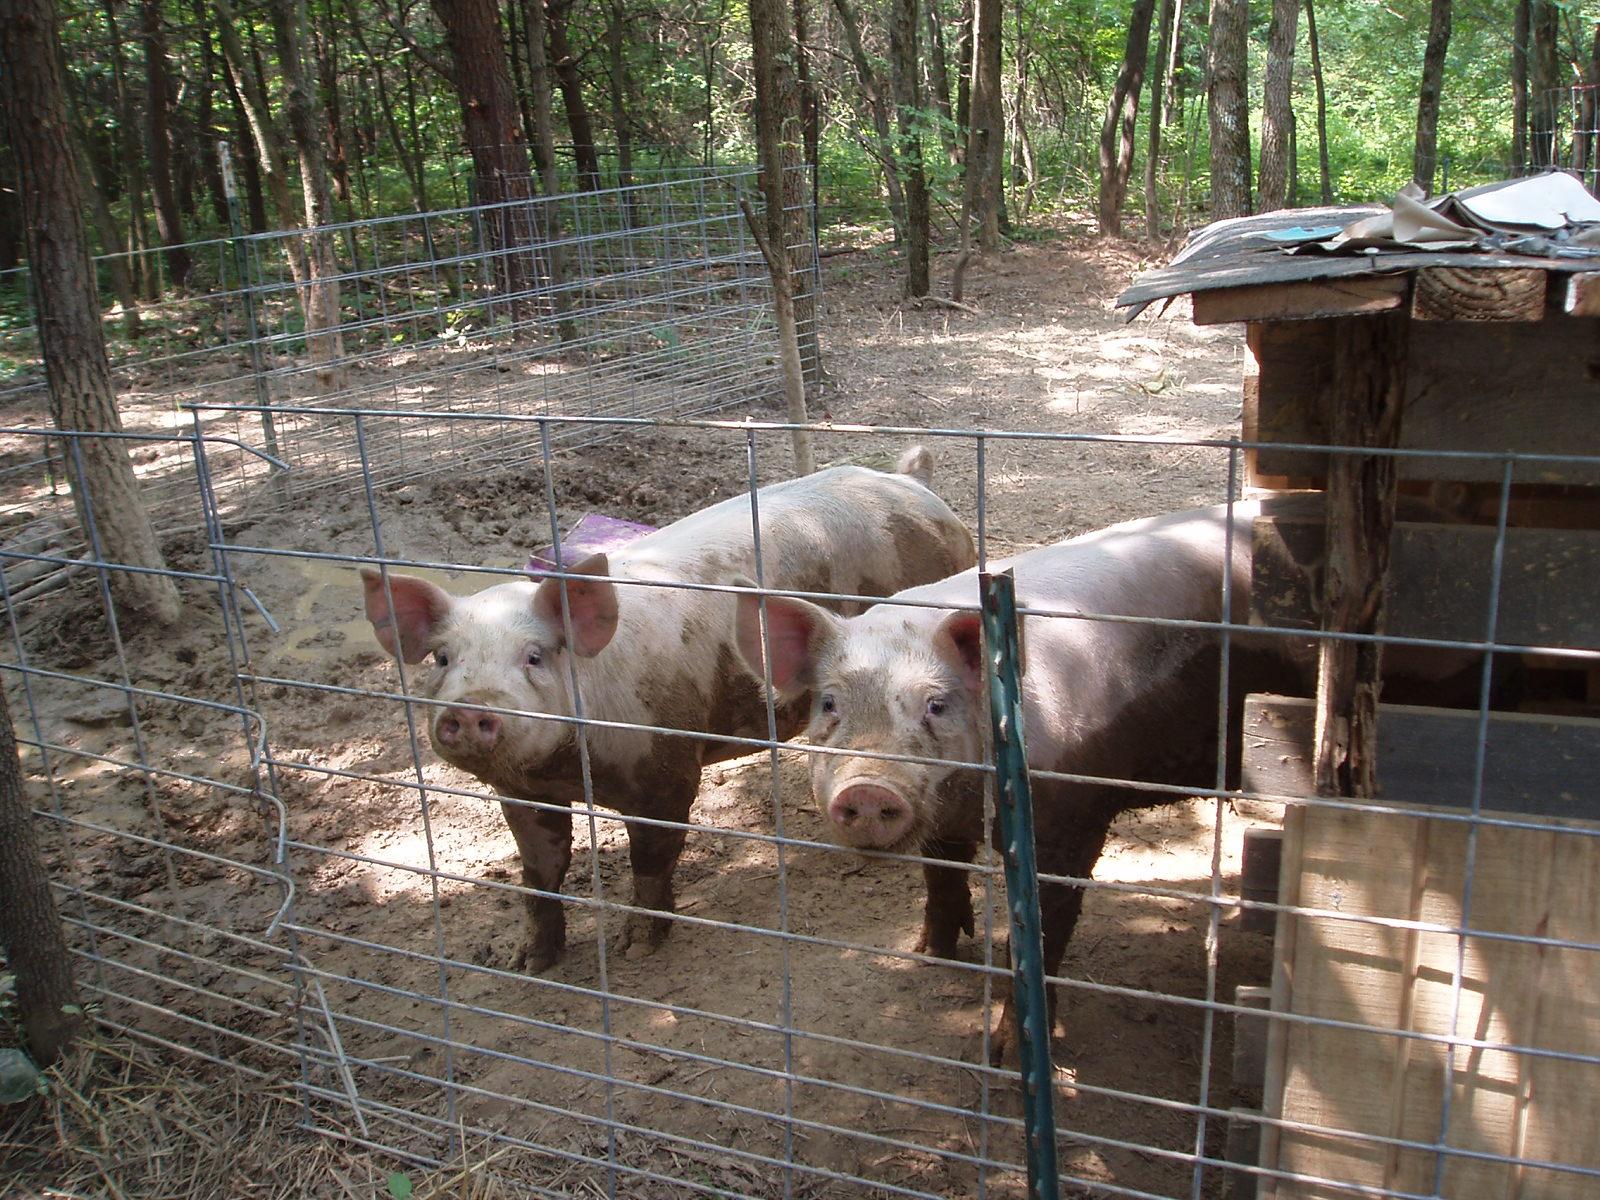 Ohiofarmgirl S Adventures In The Good Land How To Grow